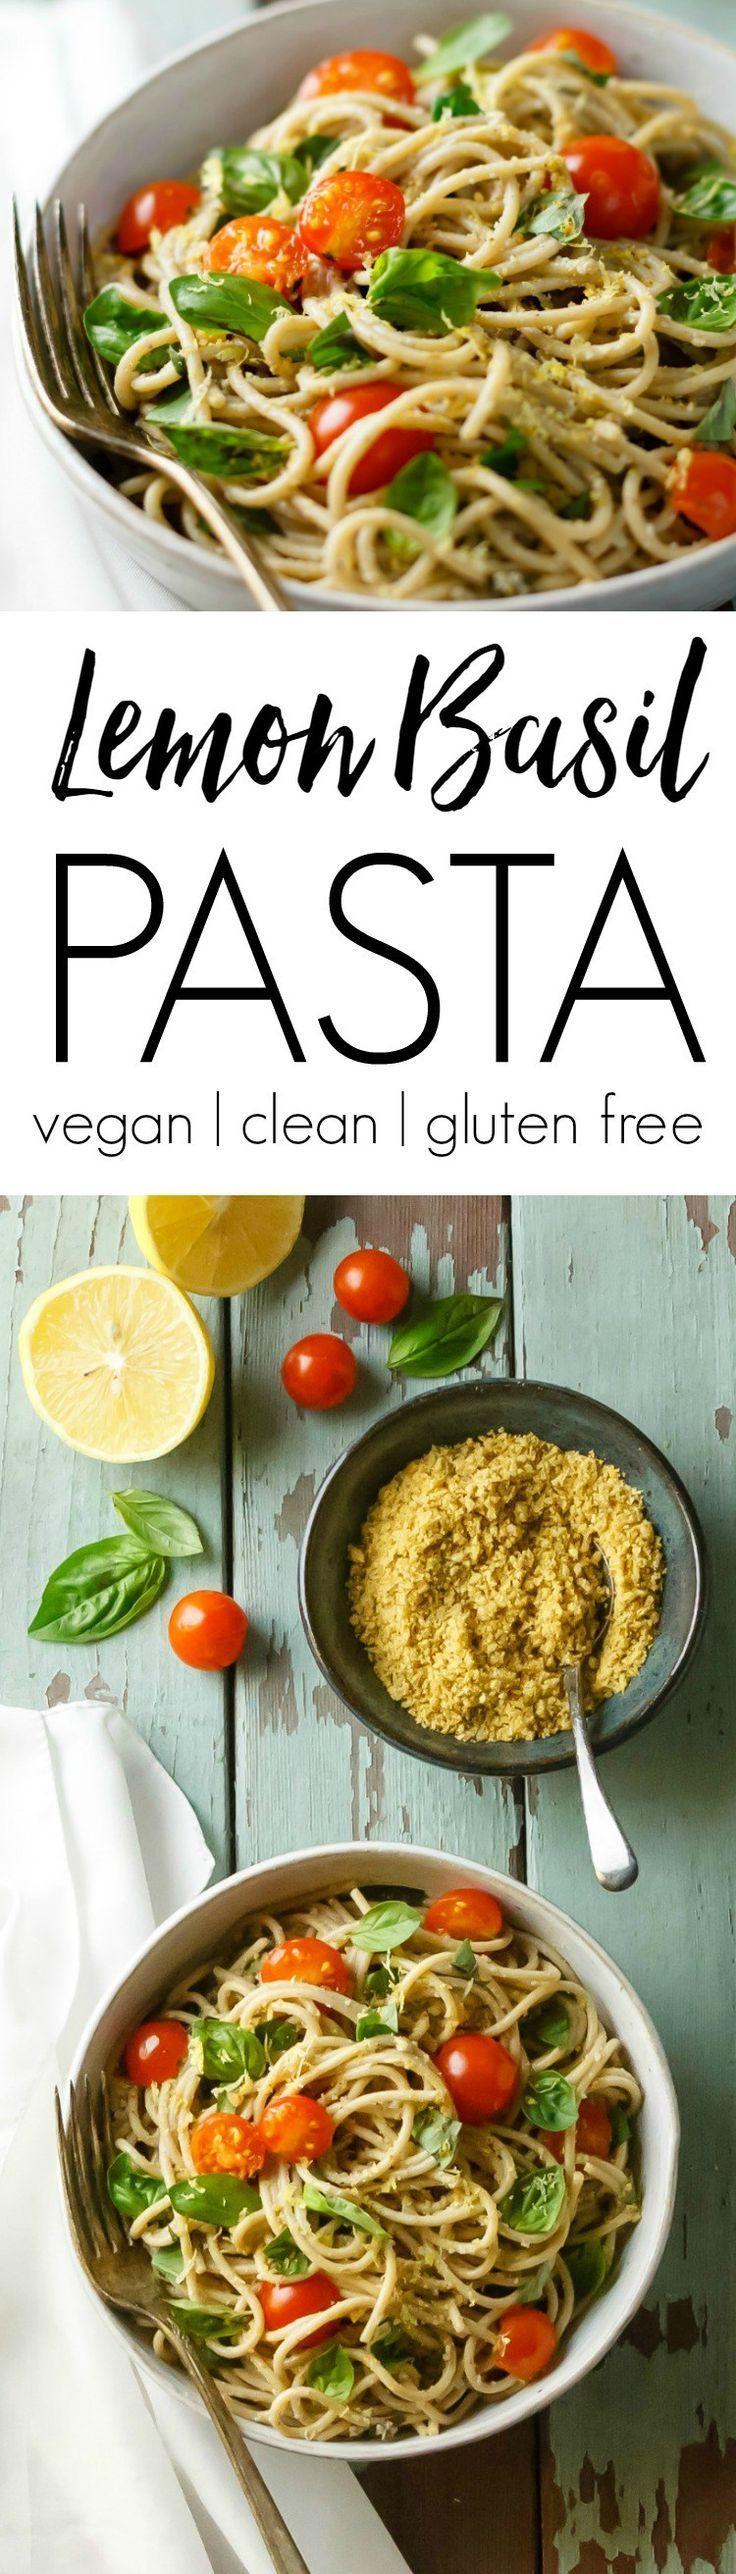 Lemon Basil Pasta with Walnut Parmesan is quick, easy, healthy, delicious! Perfect spring/summer meal. | lemon basil pasta recipes | vegan | meatless | vegetarian | vegan | healthy | gluten free | summer | easy |